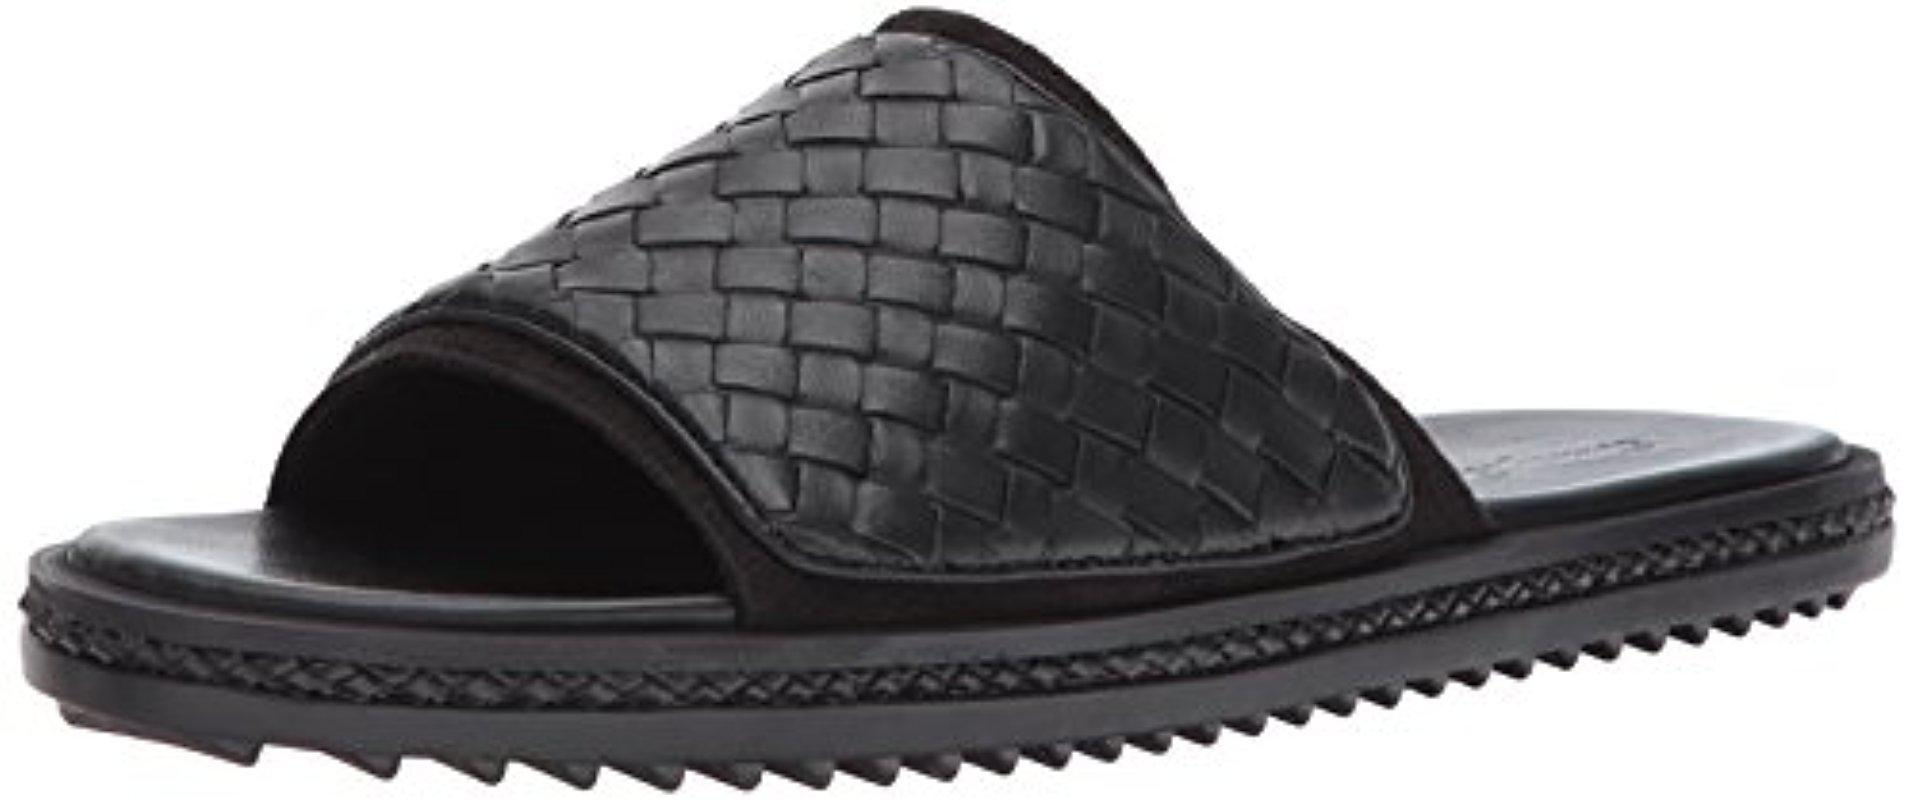 06f3f5ca687997 ... flip flops allegro navy sandals pineapple  Tommy Bahama. Men s Black  Shore Crest Slide Sandal lowest discount 9d417 70865 ...